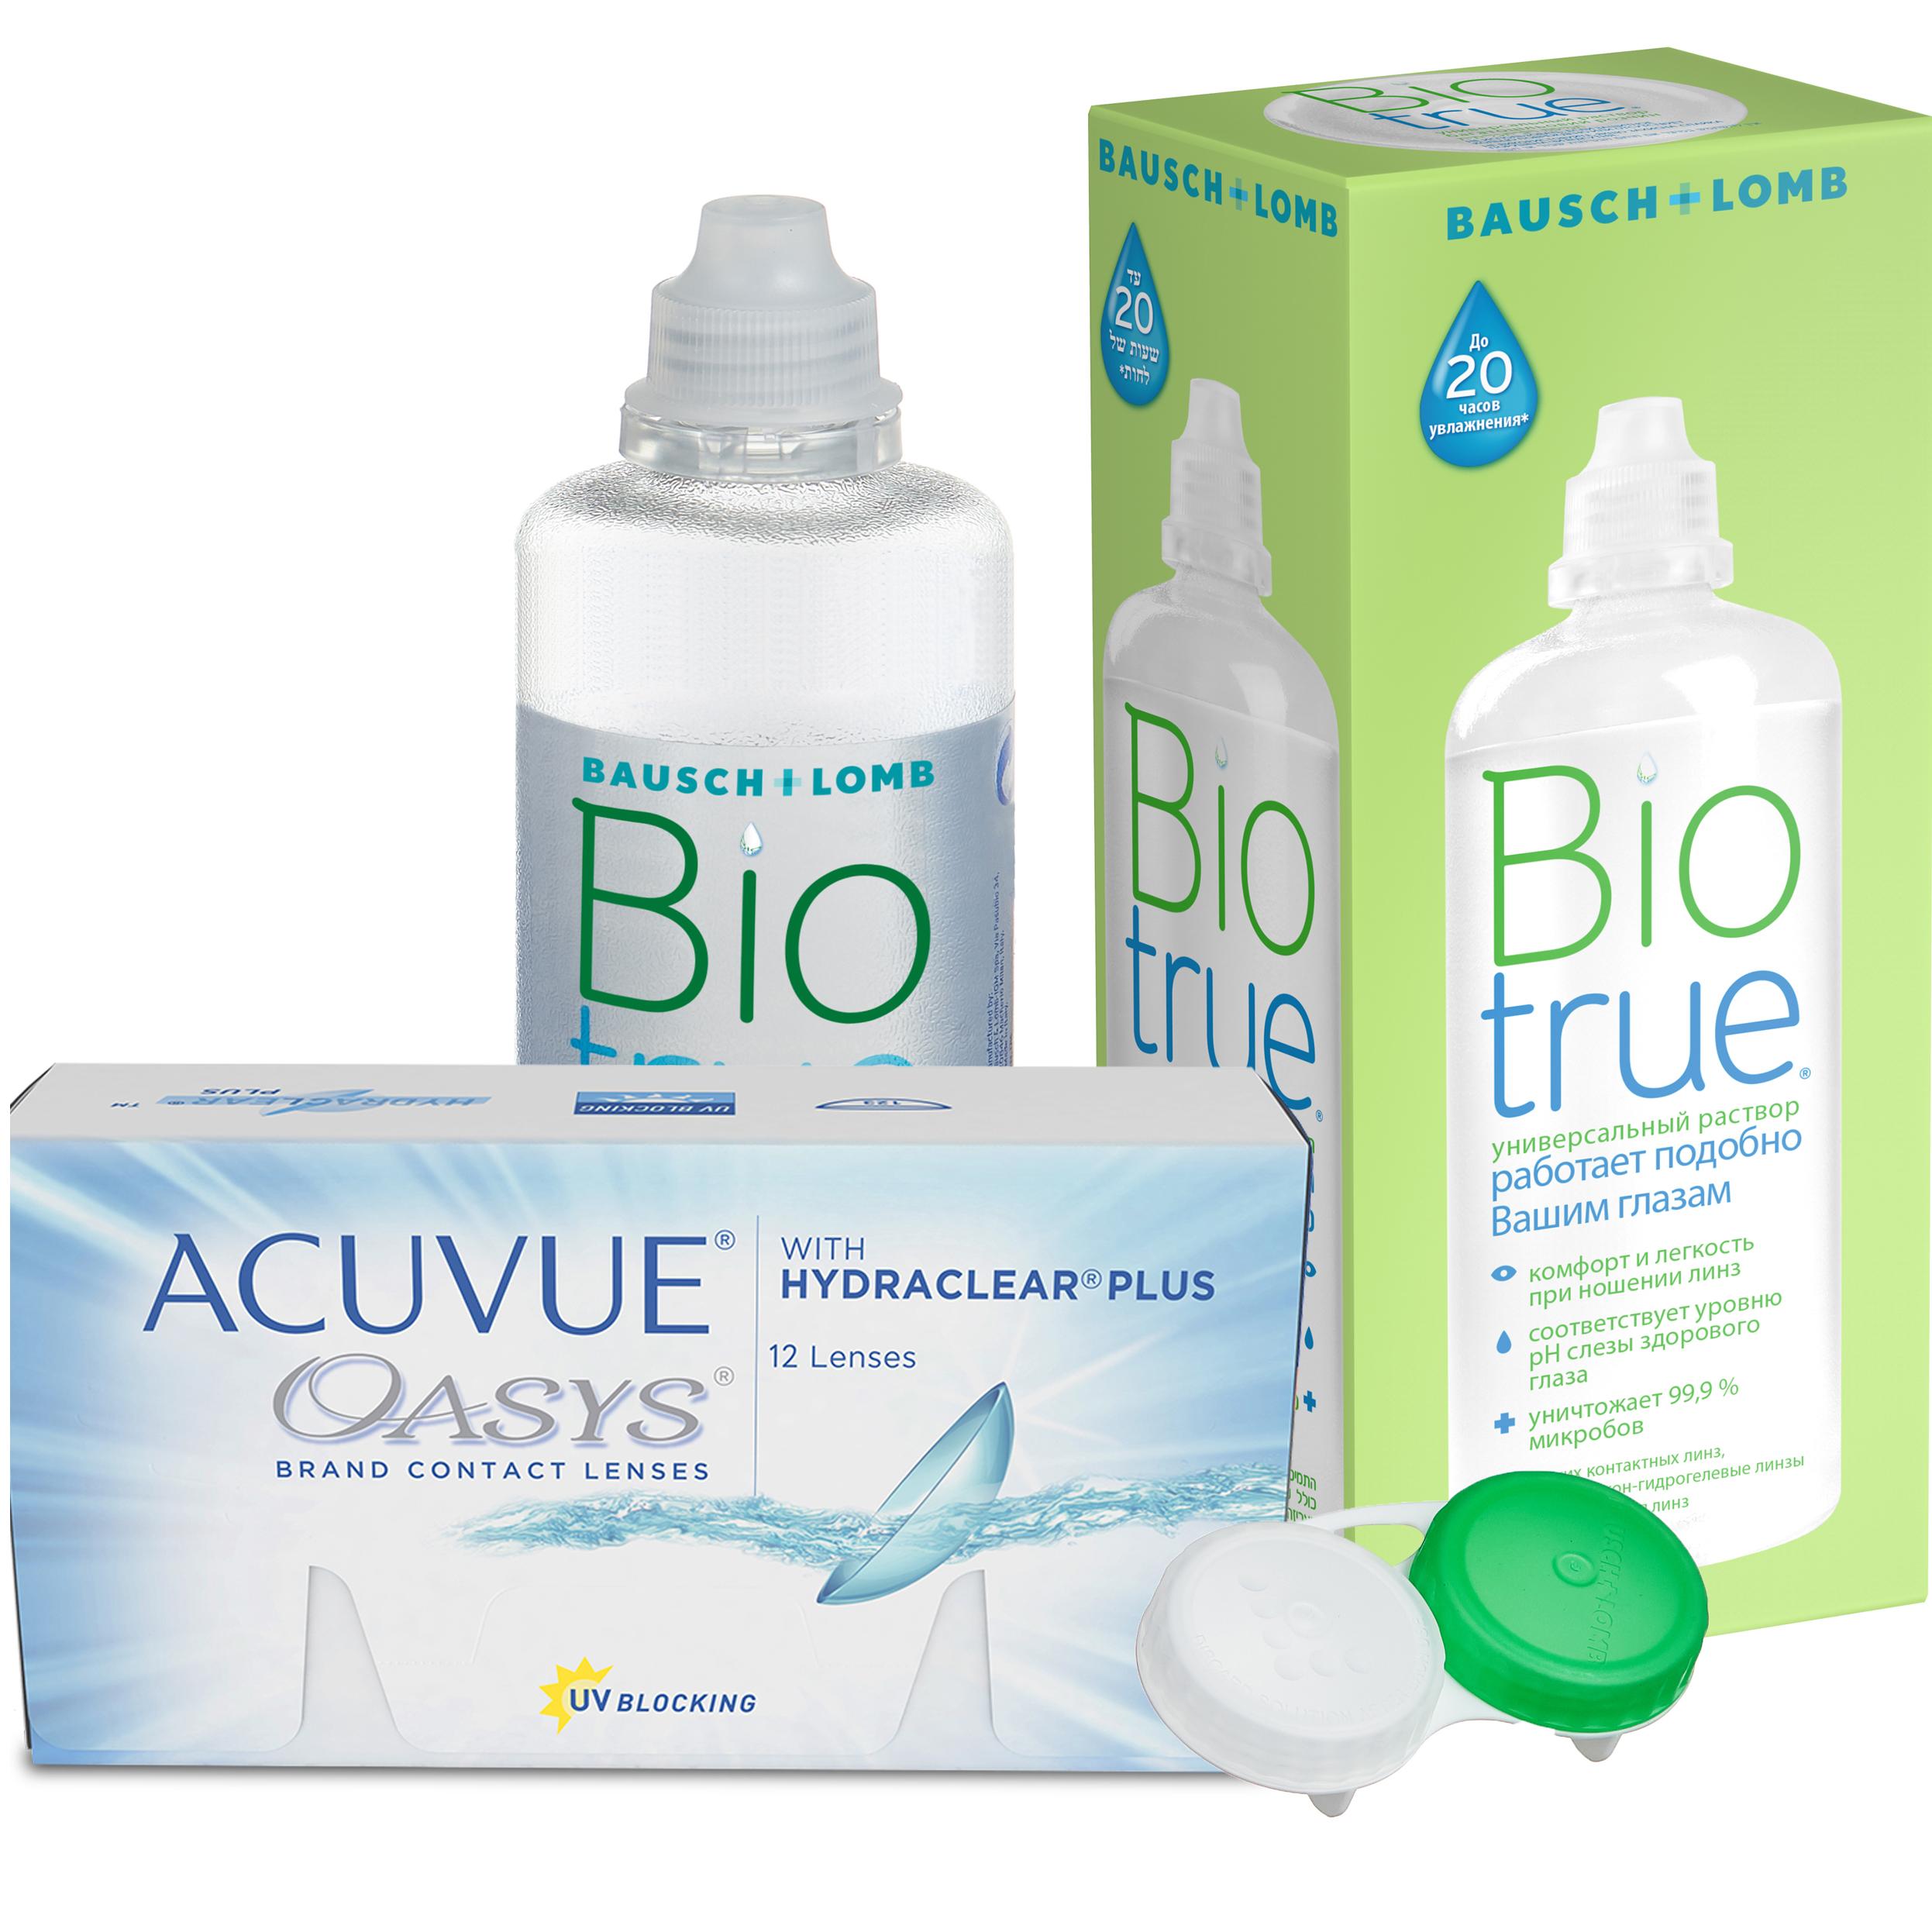 Купить Oasys with Hydraclear Plus 12 линз + Biotrue, Контактные линзы Acuvue Oasys with Hydraclear Plus 12 линз R 8.8 -11, 50 + Biotrue 300 мл